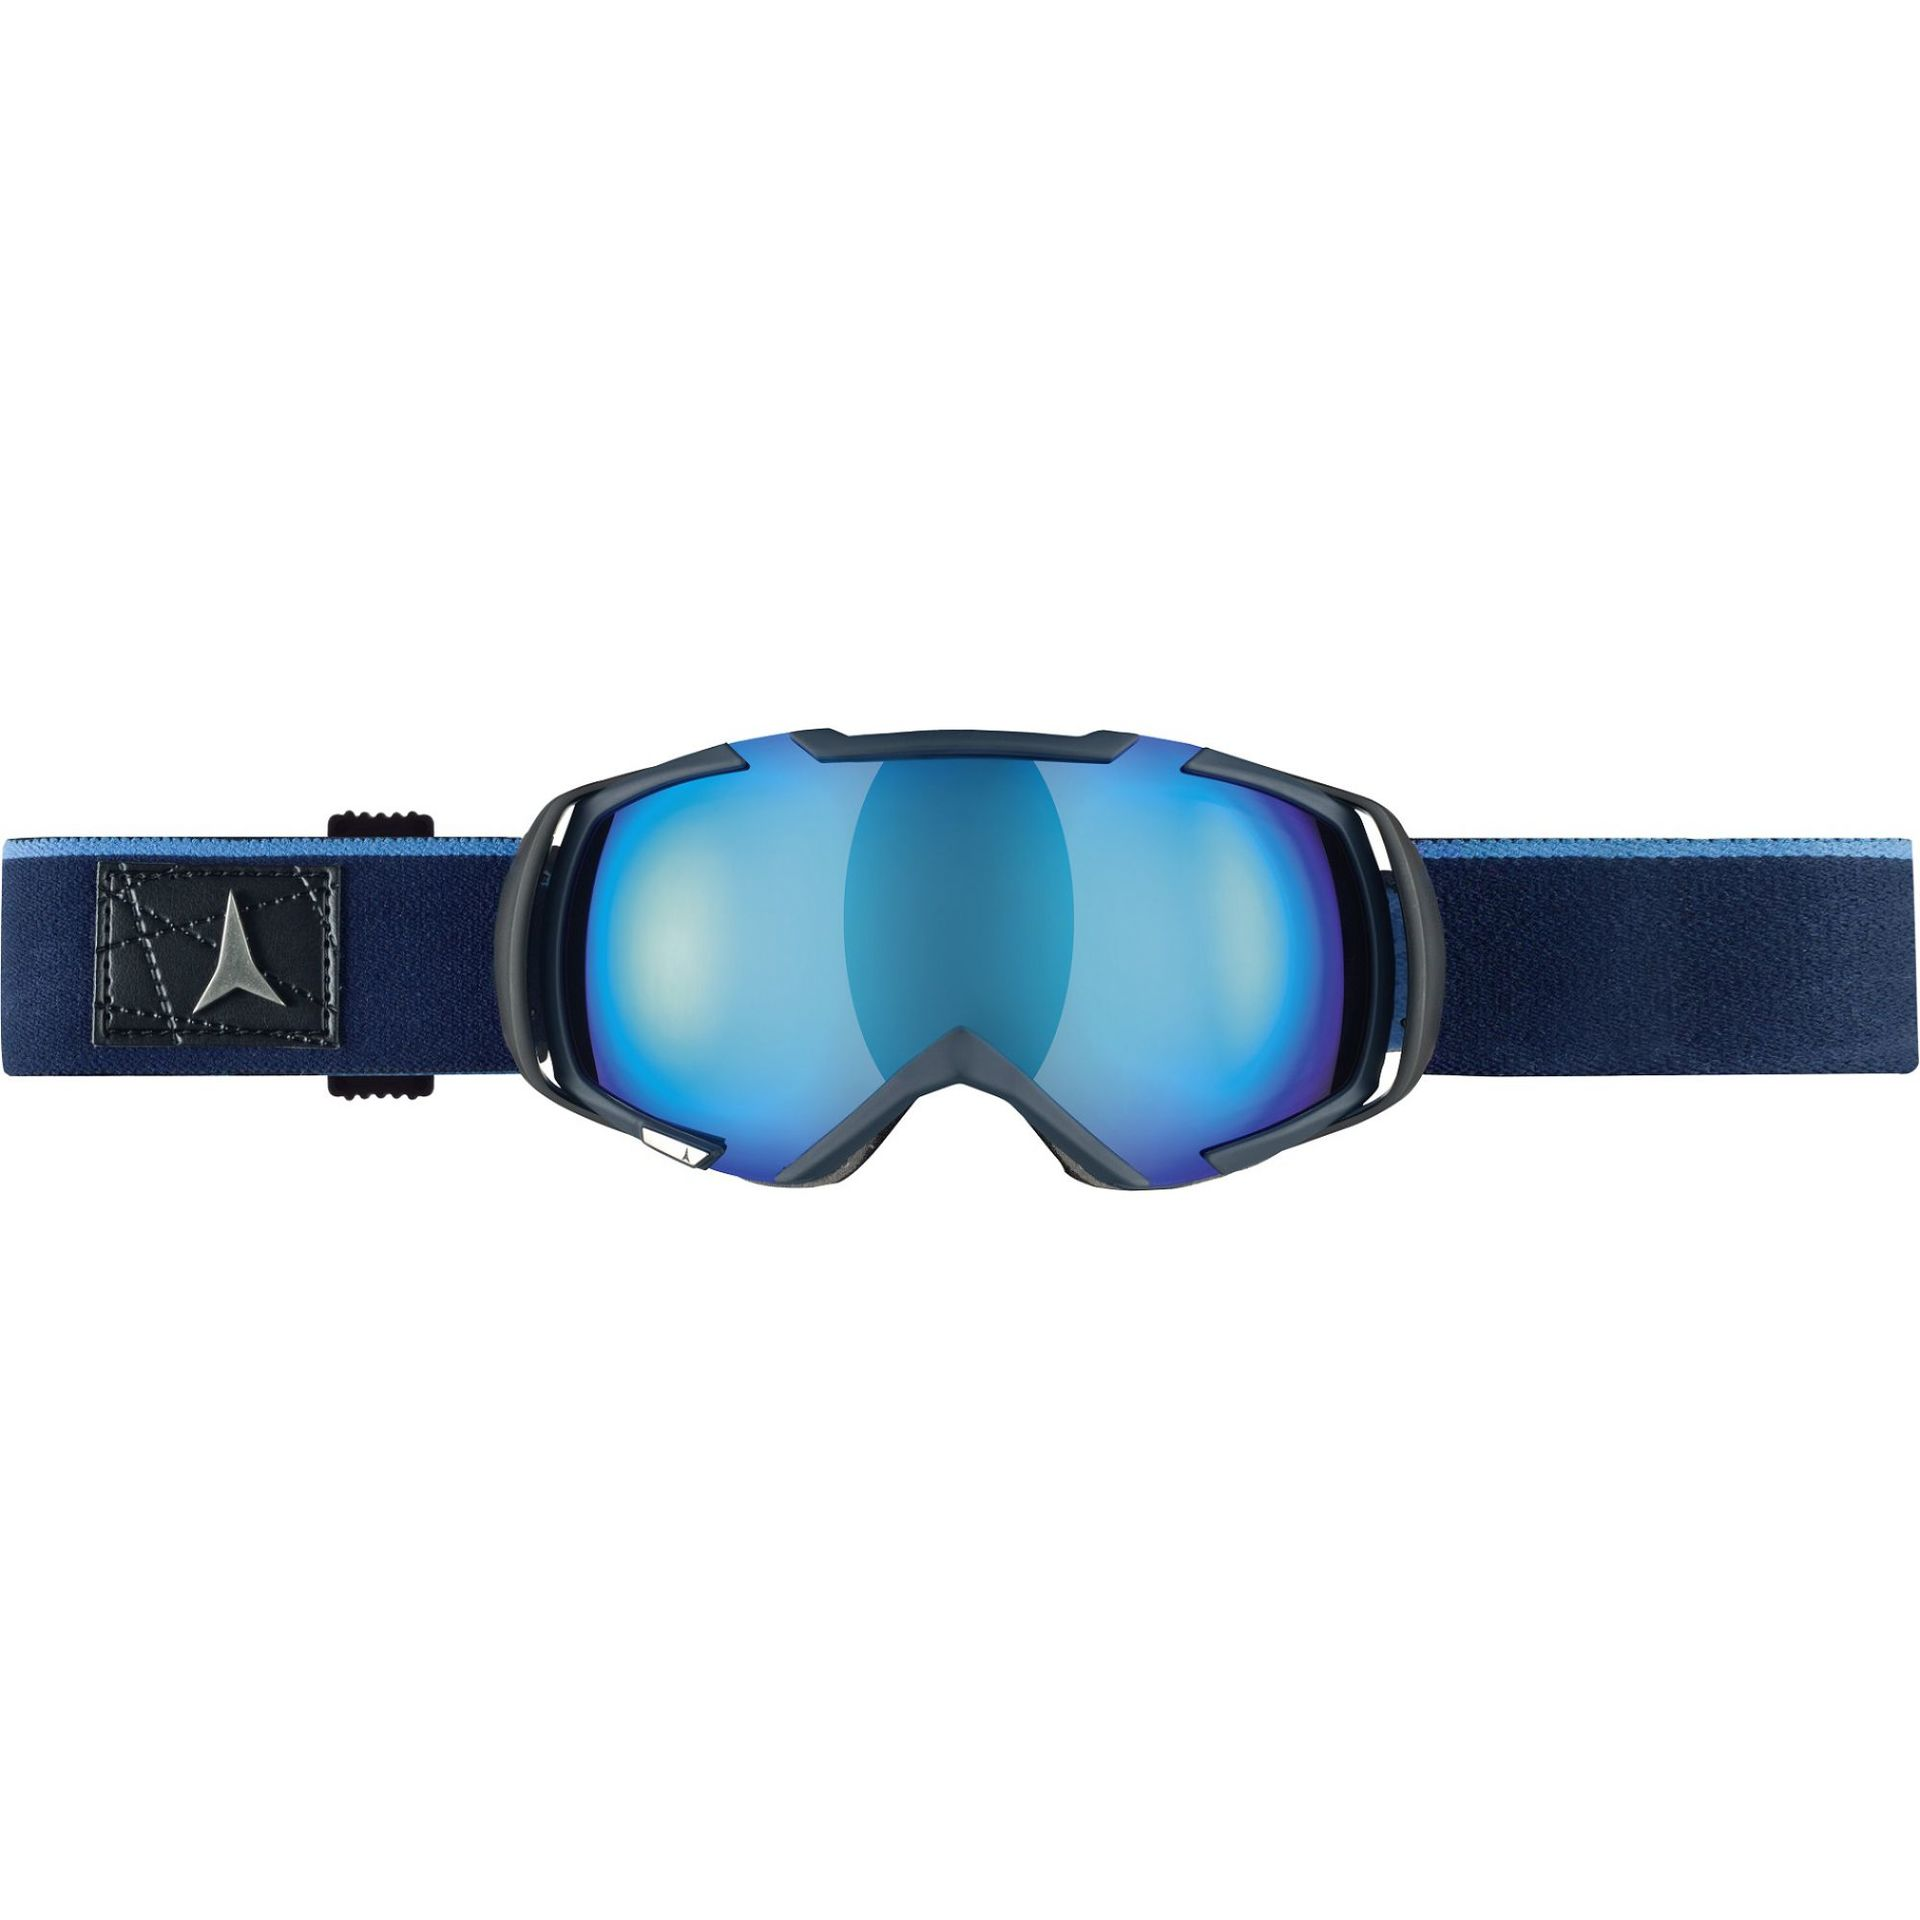 GOGLE ATOMIC REVEL 3 M  DARK BLUE|BLUE